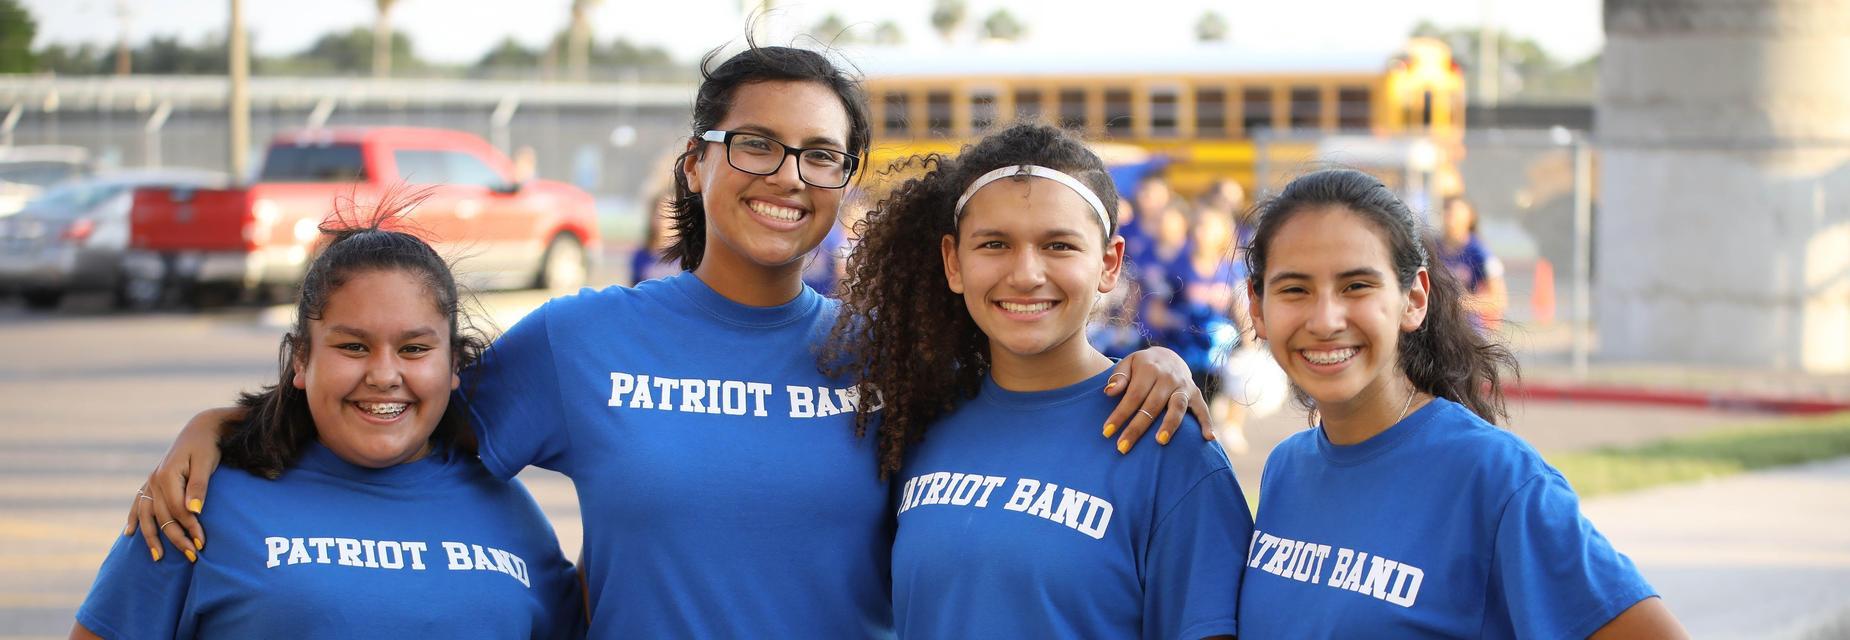 Patriot Ban students